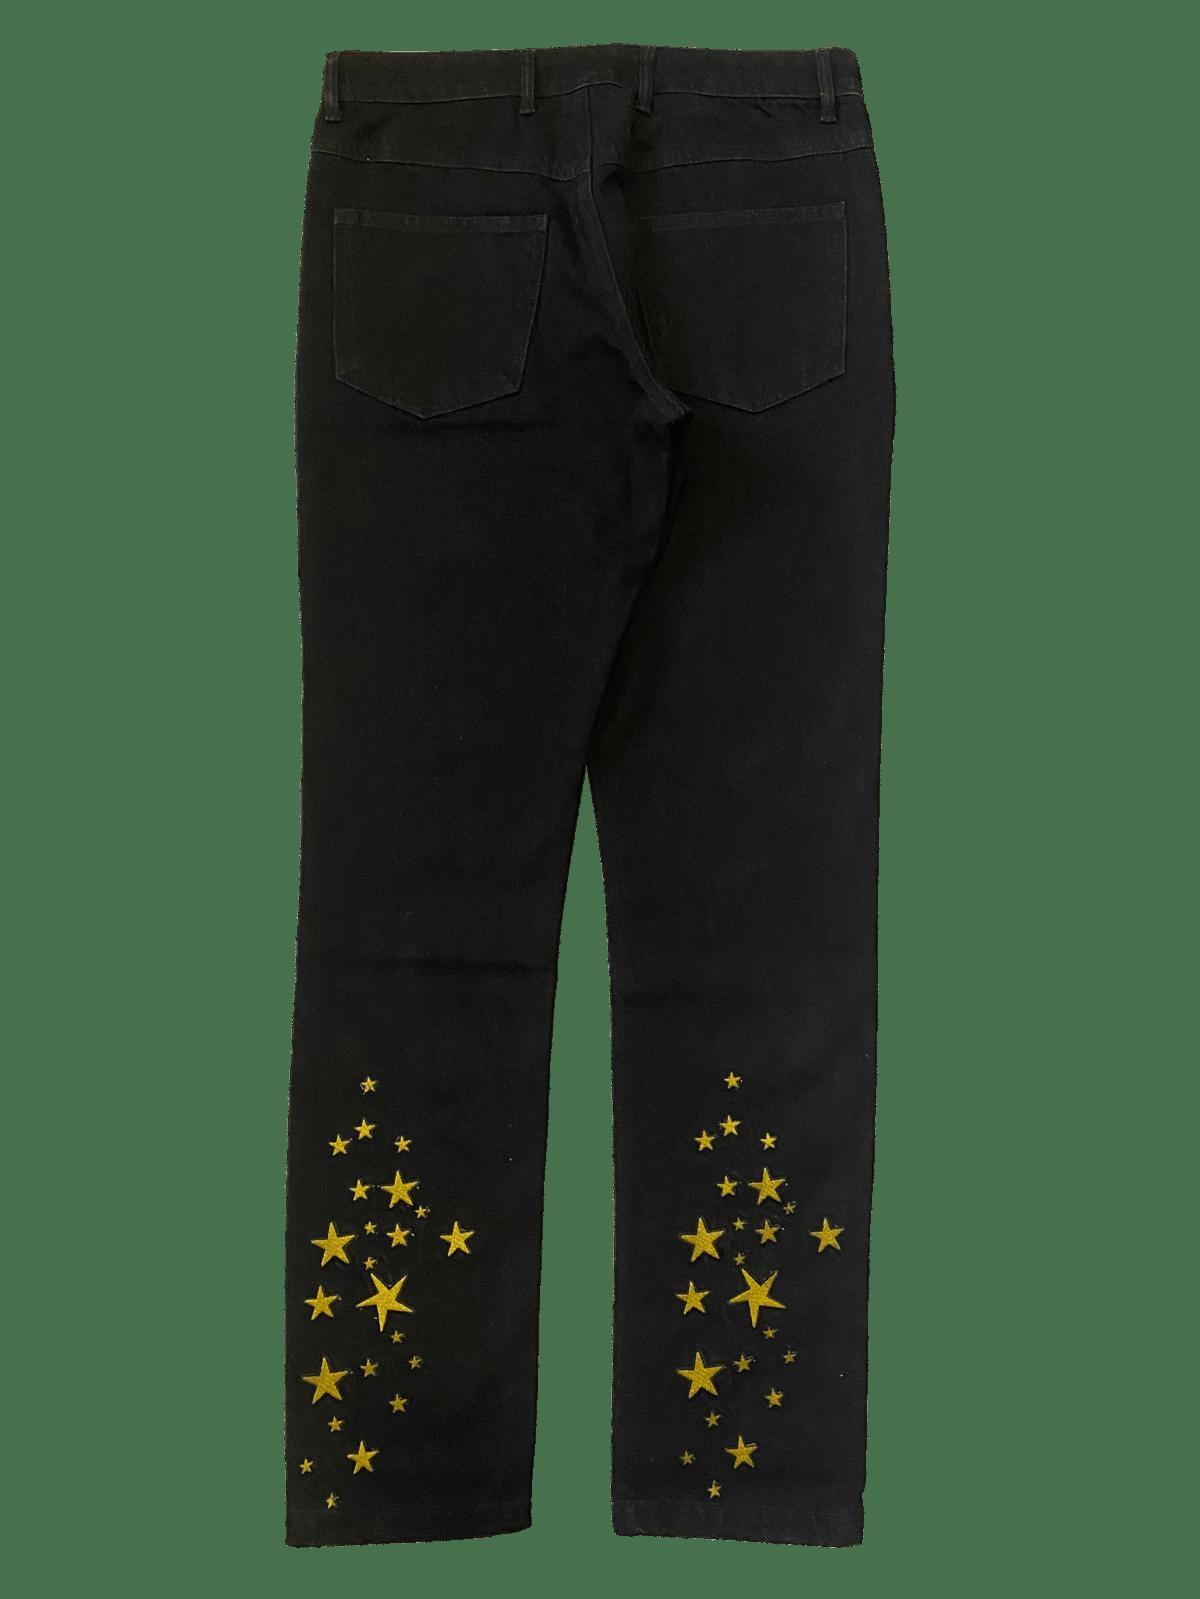 Image of SEEING STARS BLACK DENIM SLIM JEANS